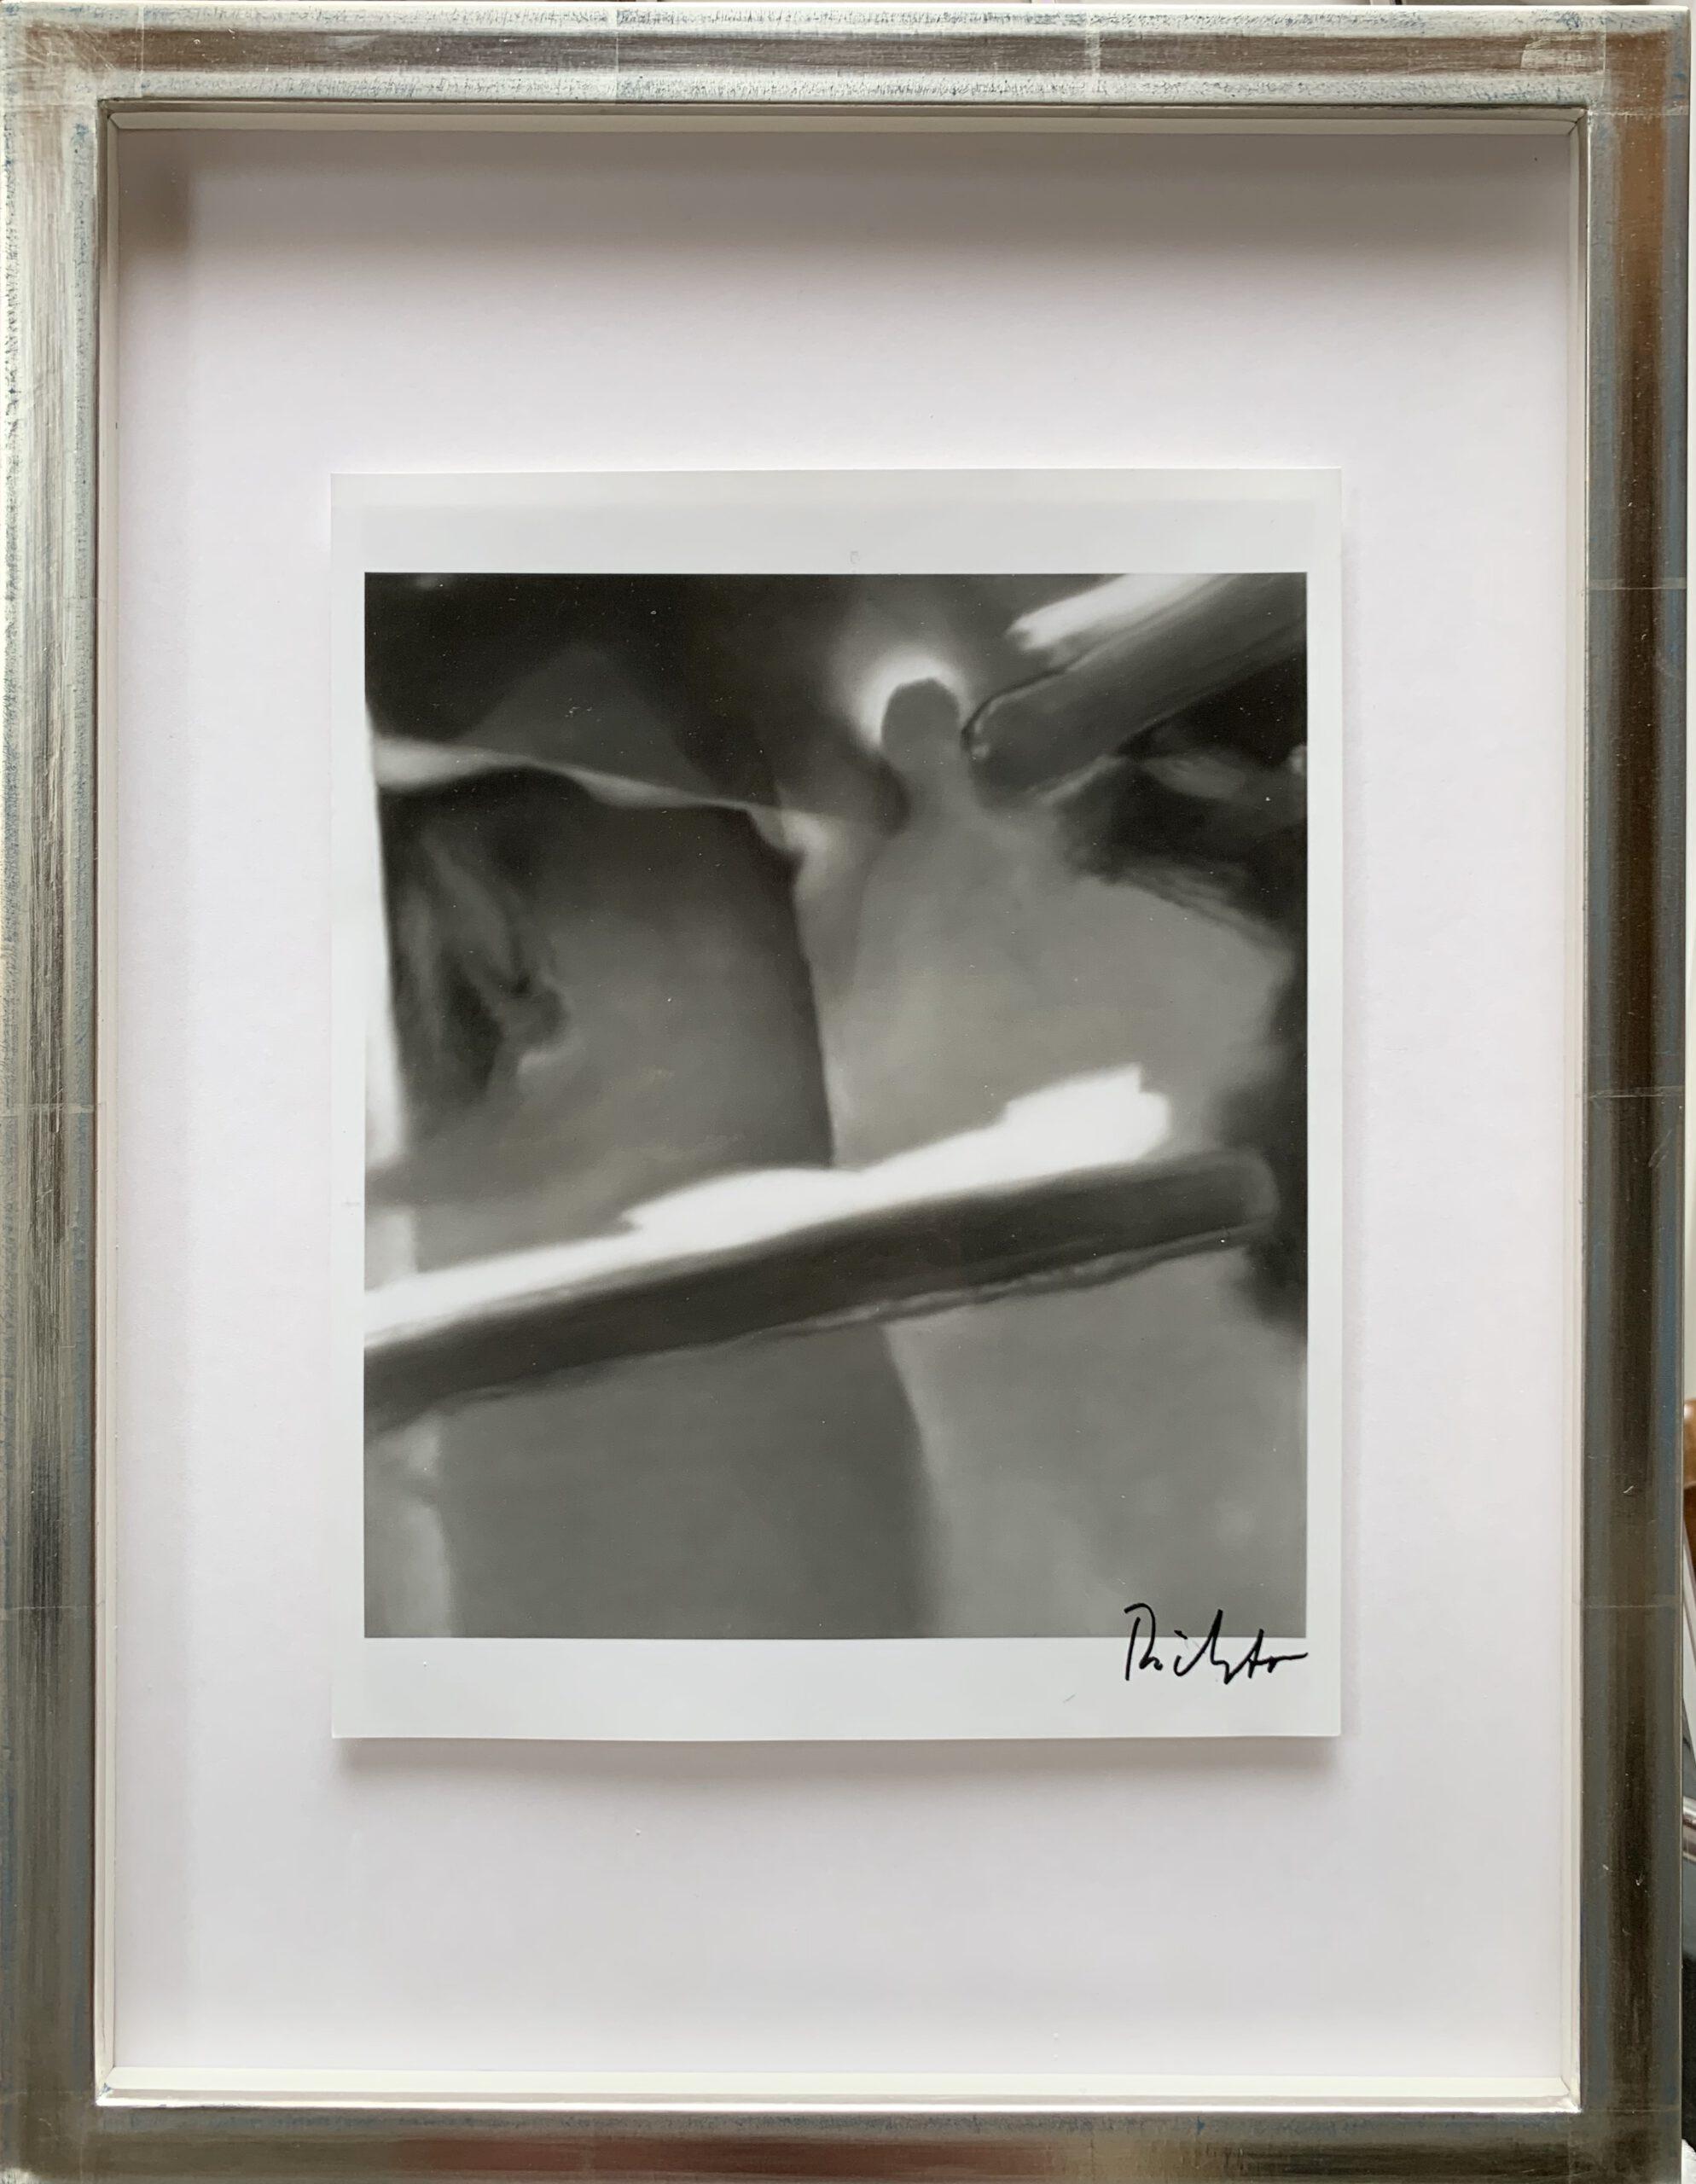 Abstract Paintings, Gemälde – Foto zur Ausstellung